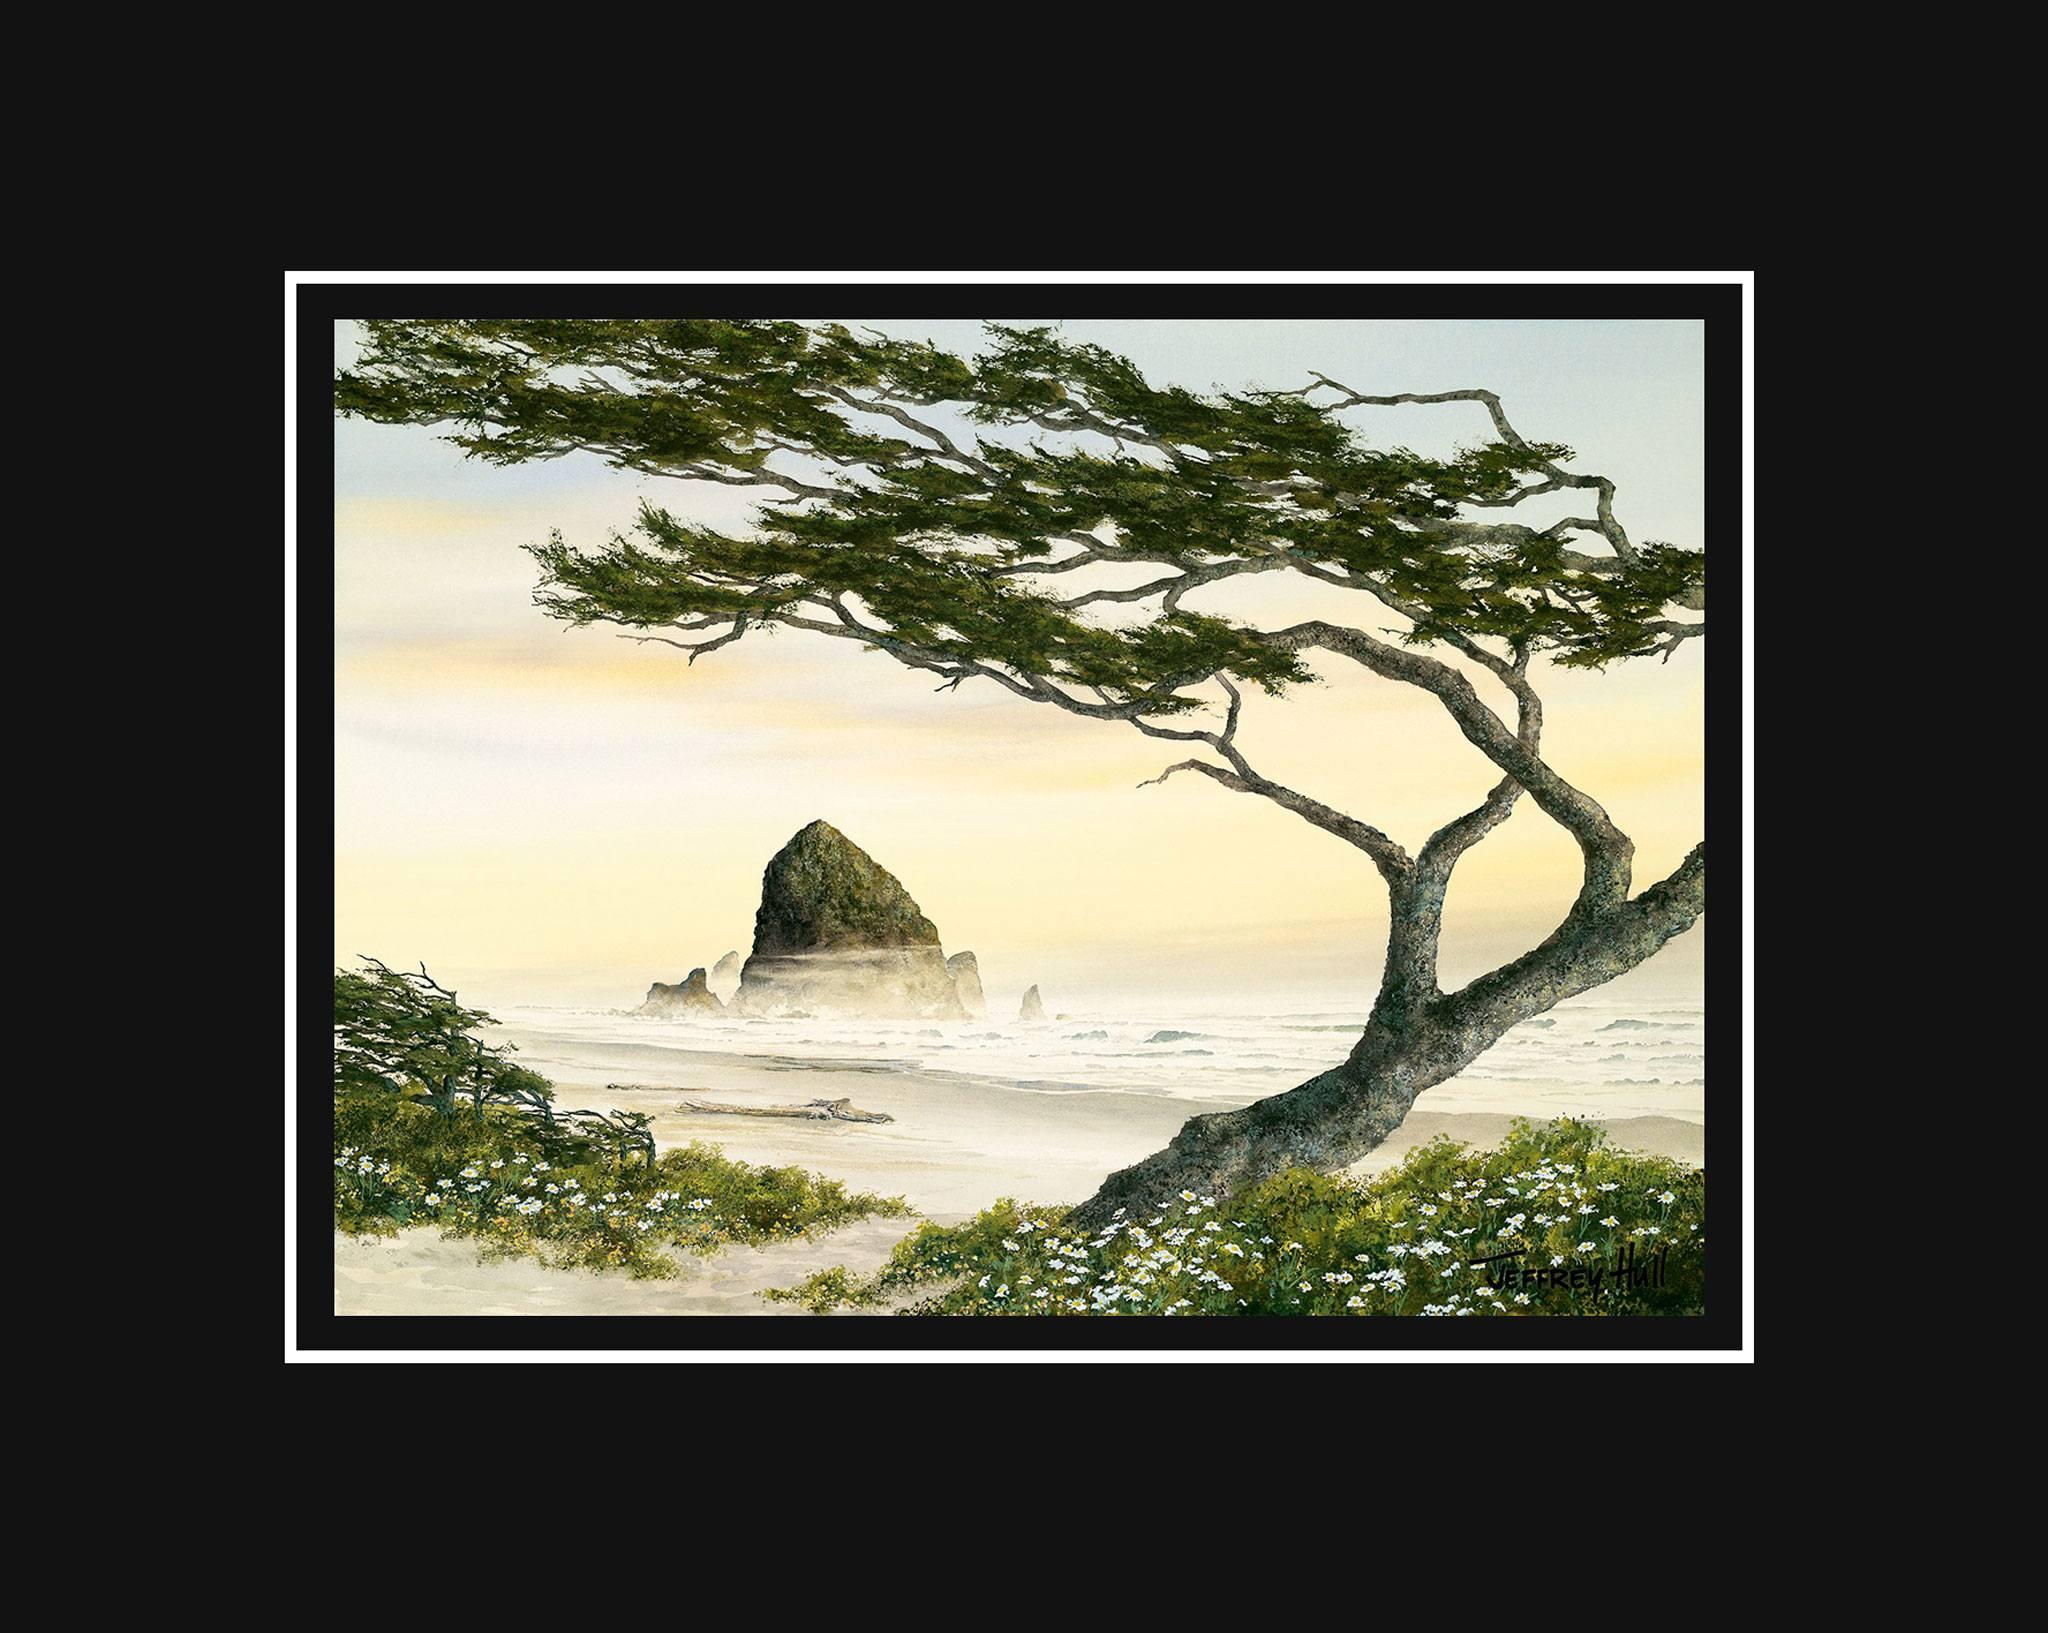 The-Wedding-Tree-Mini-Unframed-Jet-Black-4-Website-2021